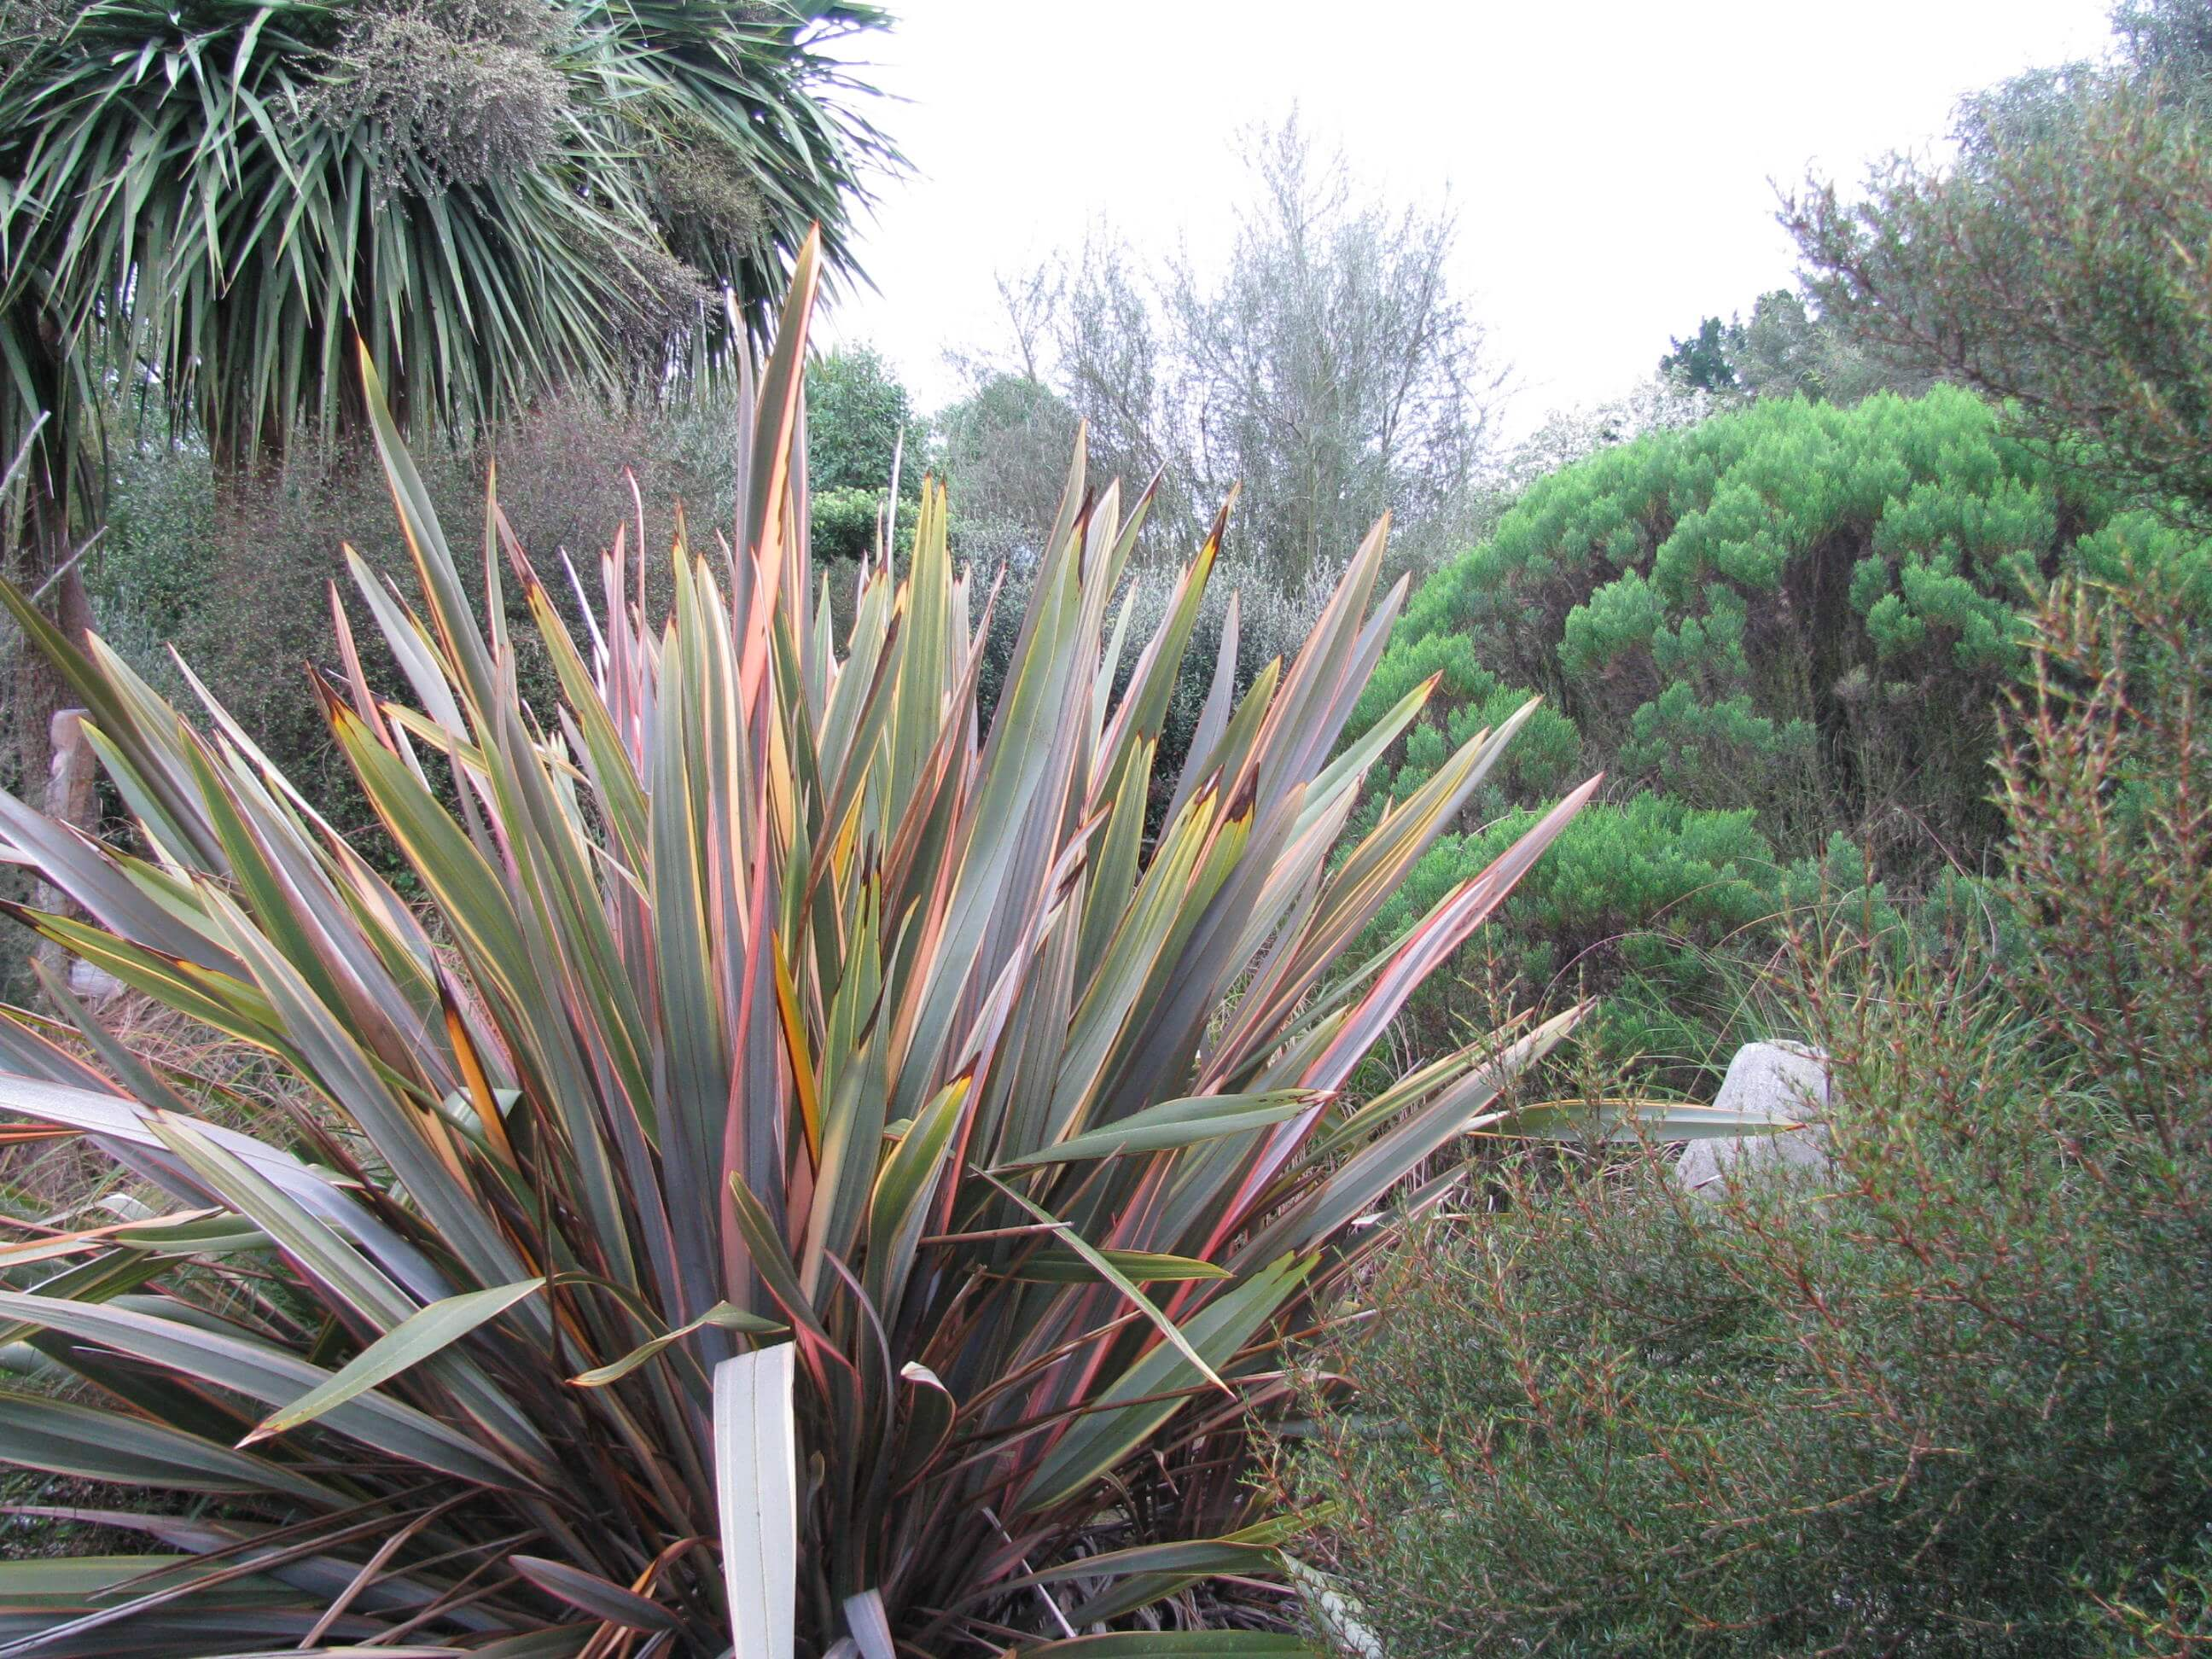 5.phormium-tenax-flax.jpg